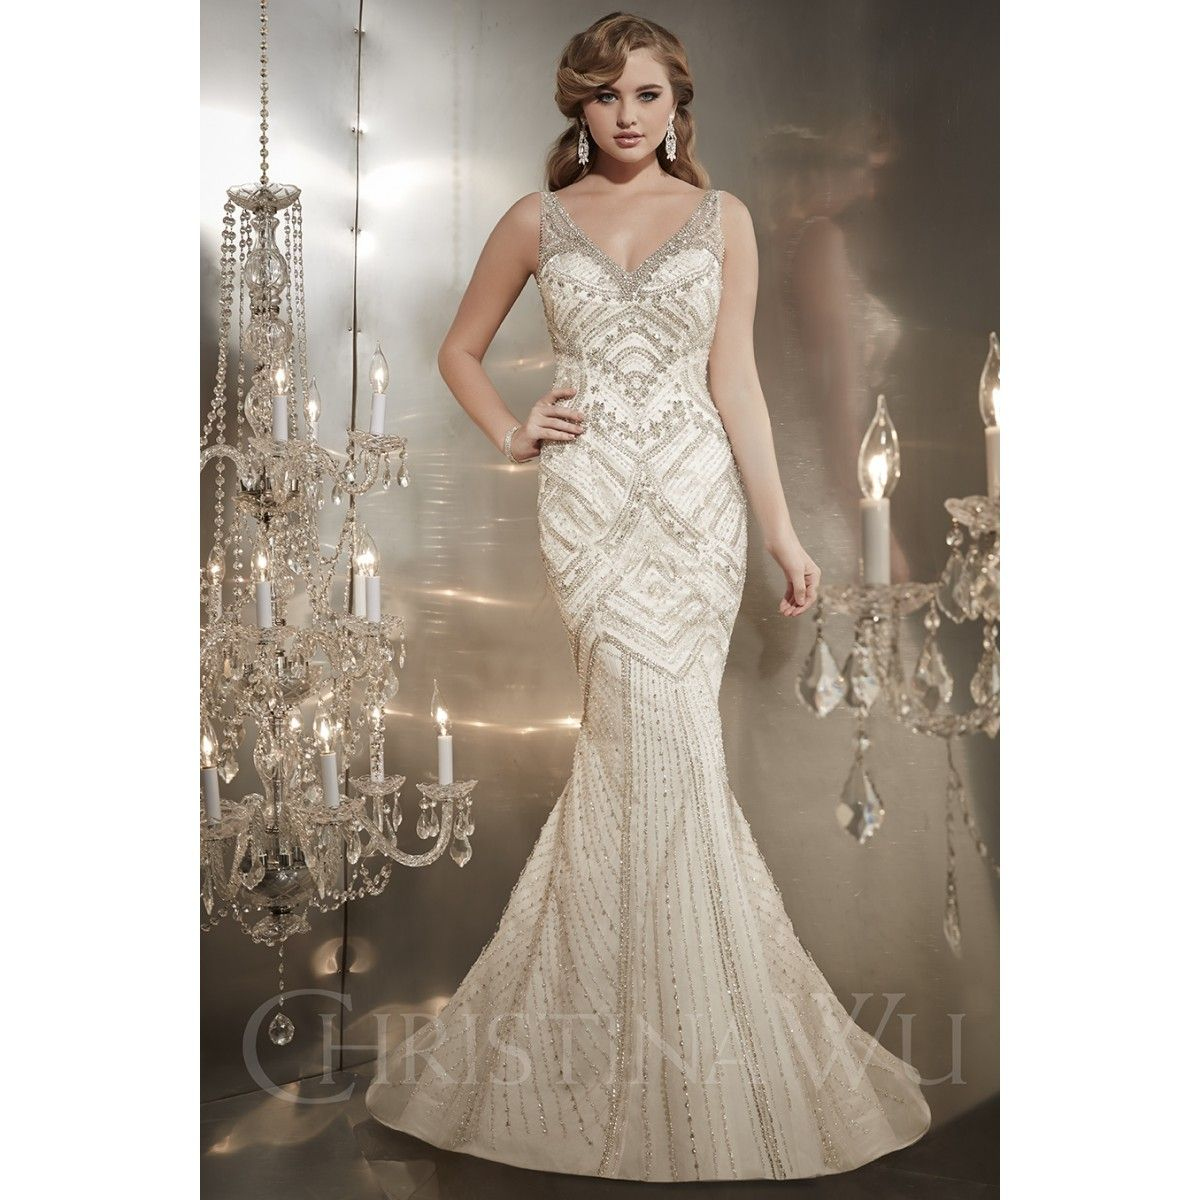 Christina wu style christina wu bridal wedding dresses